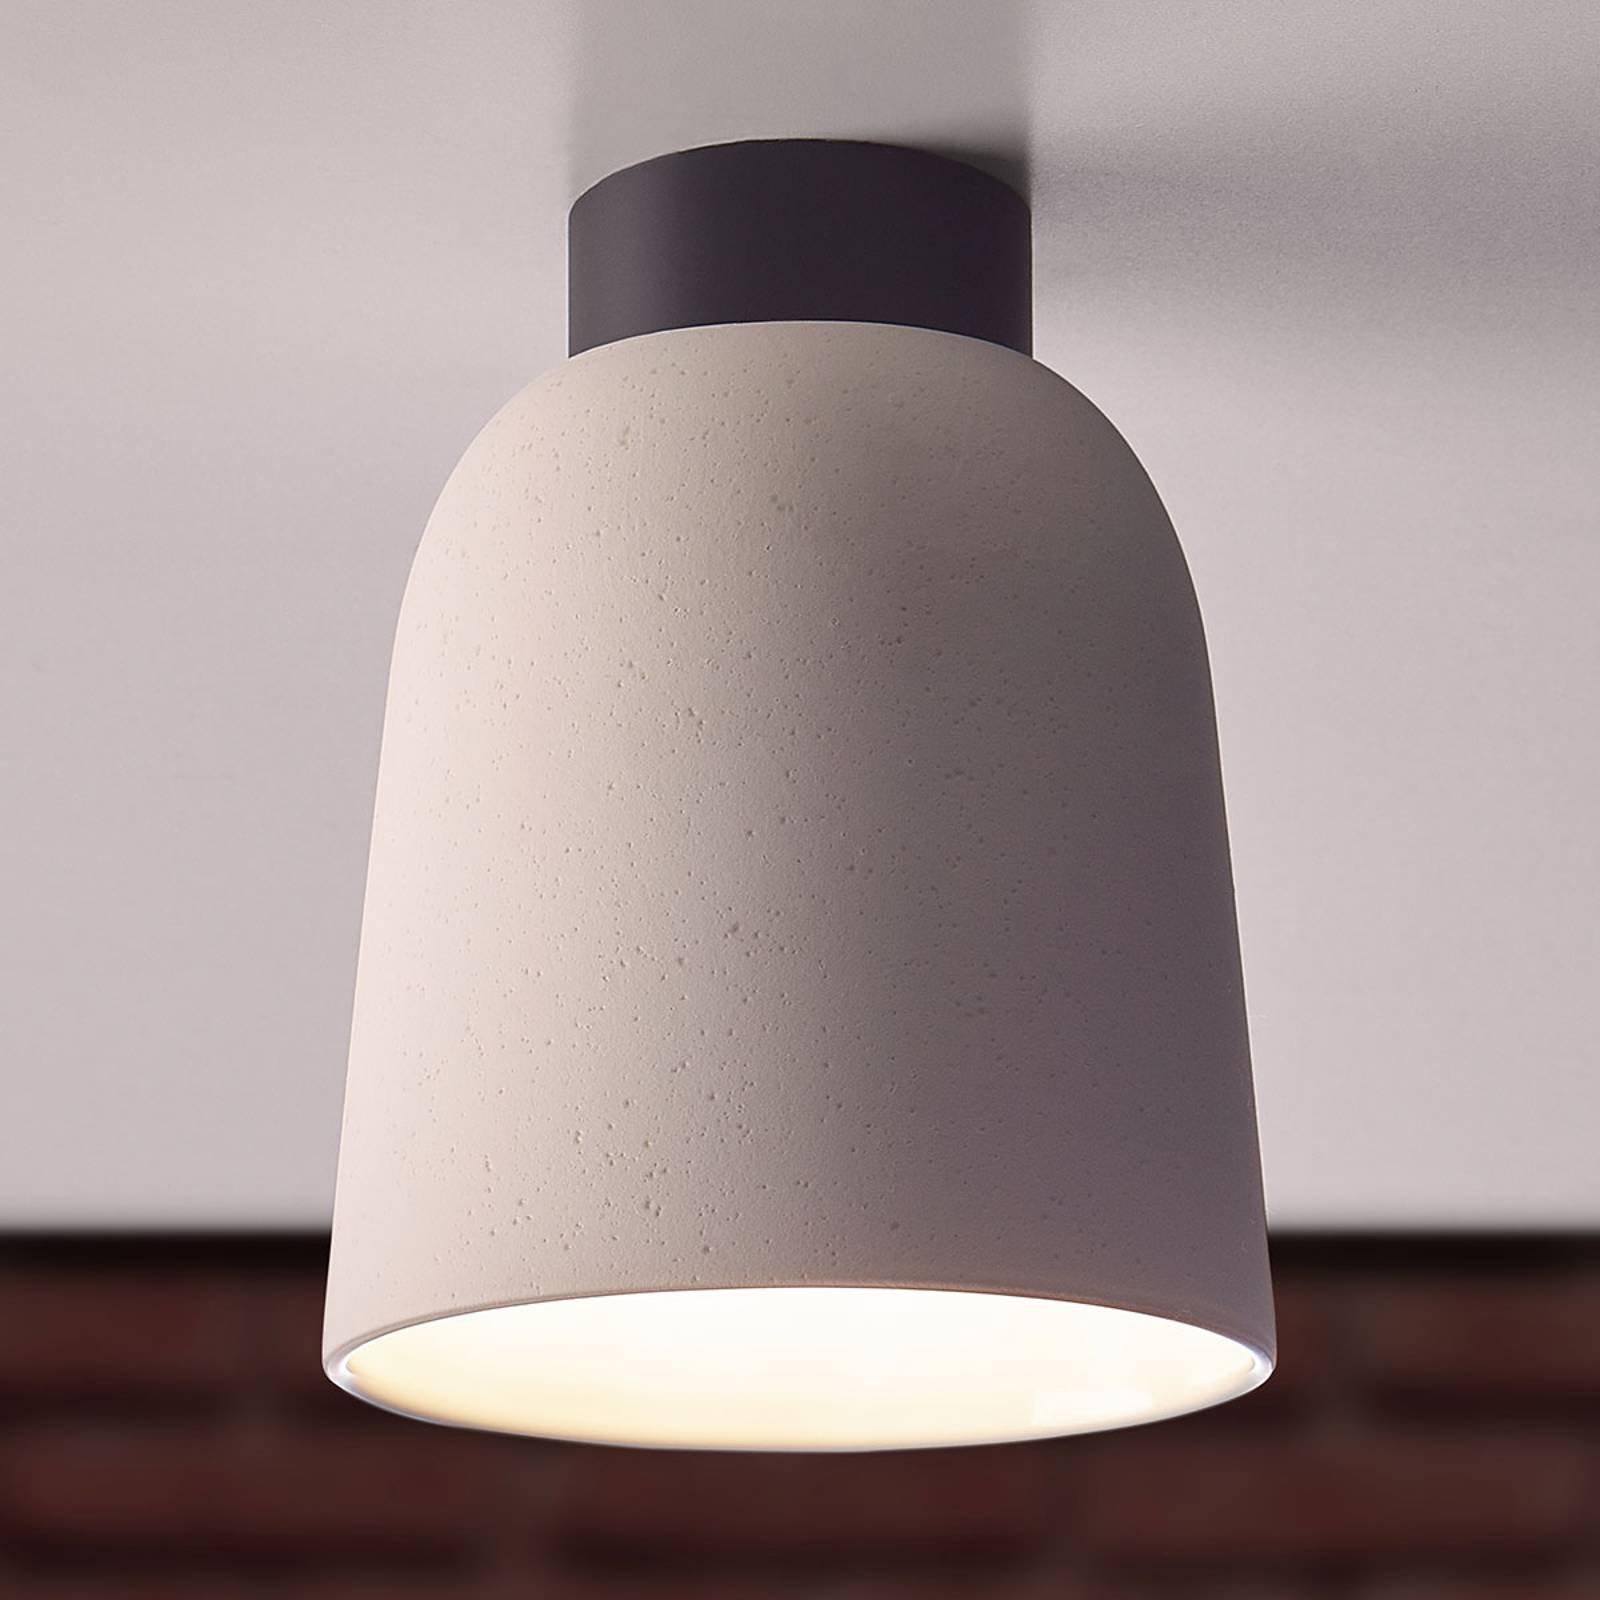 Casablanca Clavio keramisk taklampe i kremhvit